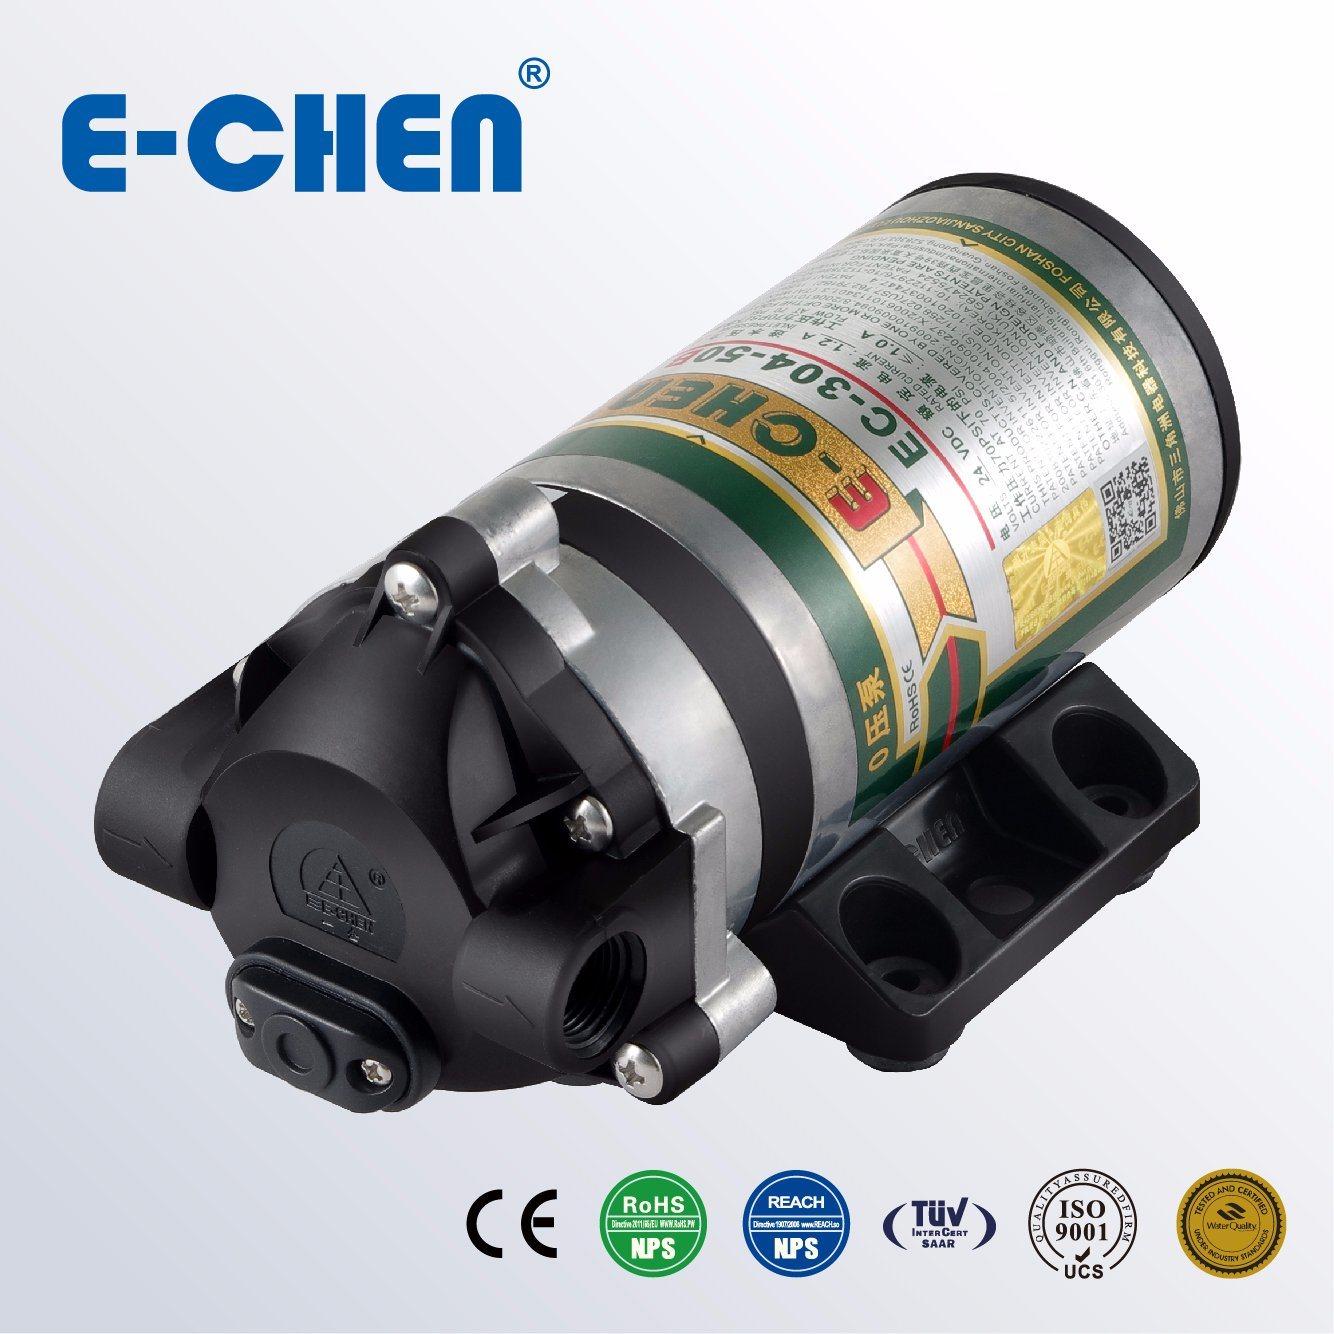 E-Chen 304 Series 200gpd Diaphragm RO Booster Pump - Designed for 0 Inlet Pressure Water Pump